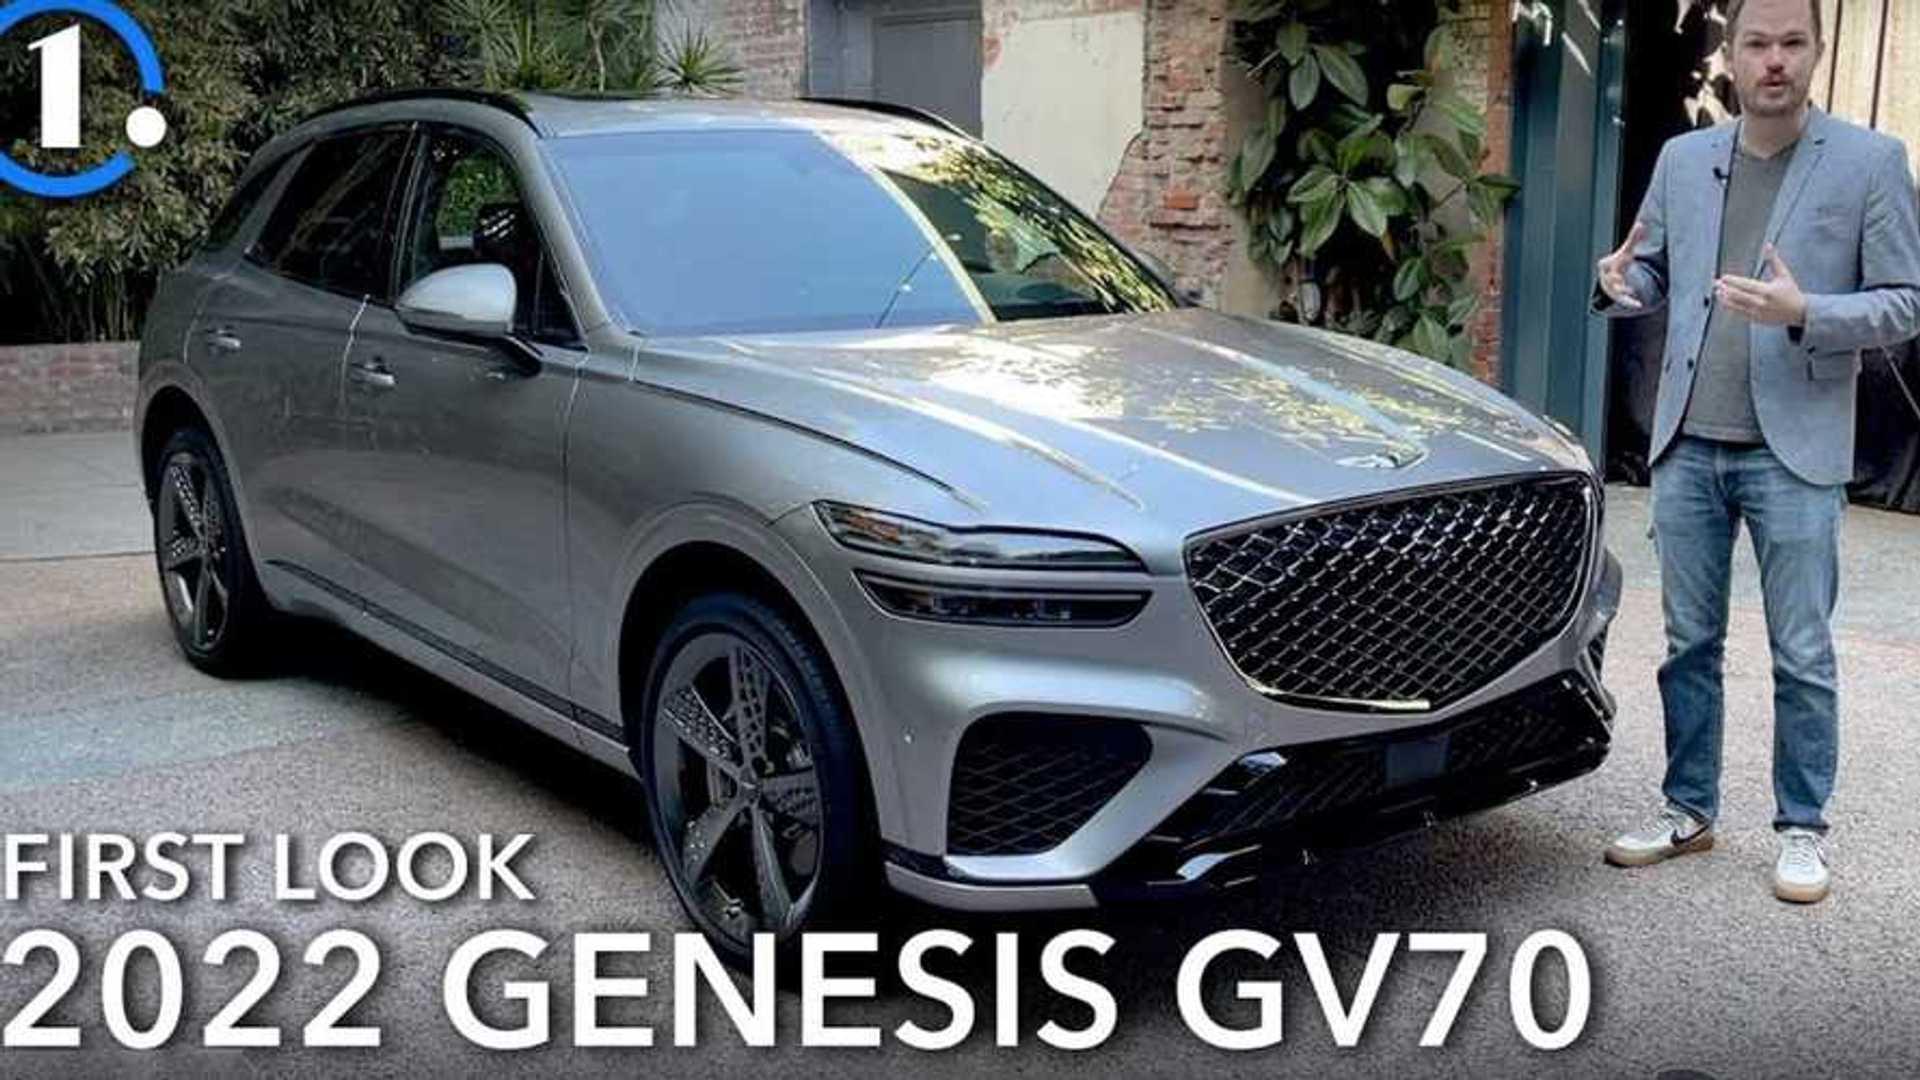 Genesis Gv70 2022 Jauh Lebih Sporty Tanpa Kehilangan Kesan Mewah